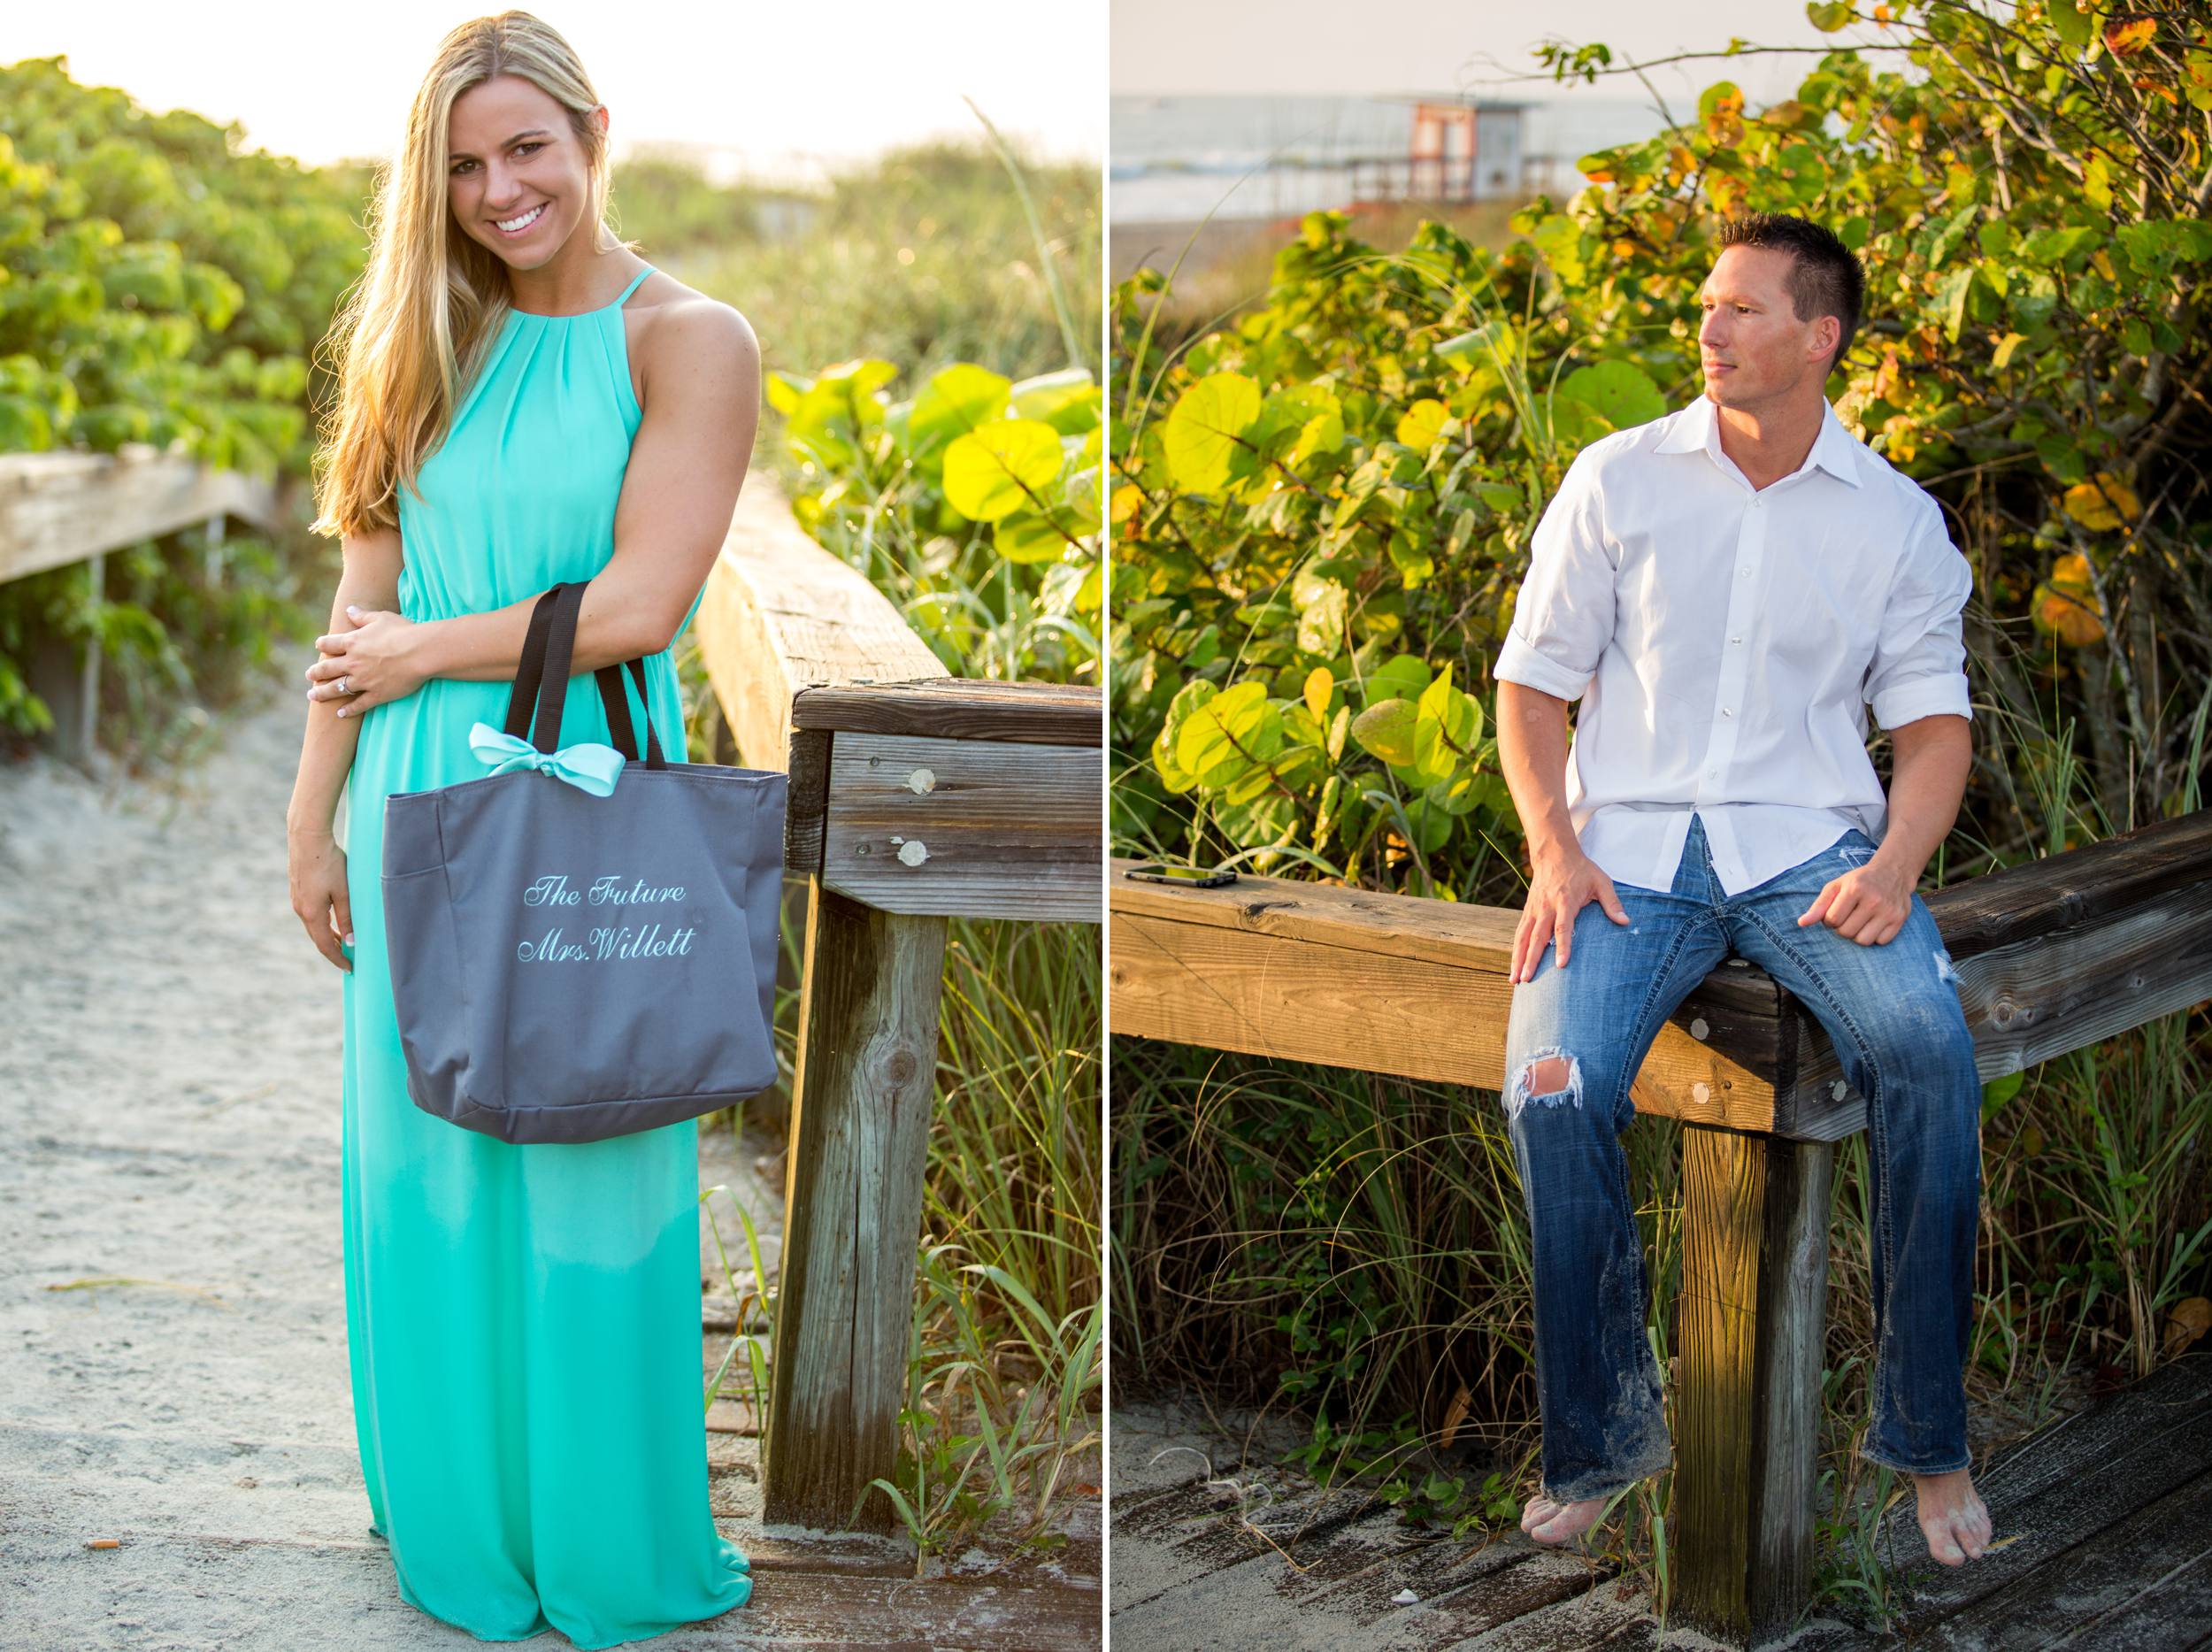 Lori Wilson Park Cocoa Beach Sunrise Engagement Session Mint Green dress- Bri 13.jpg